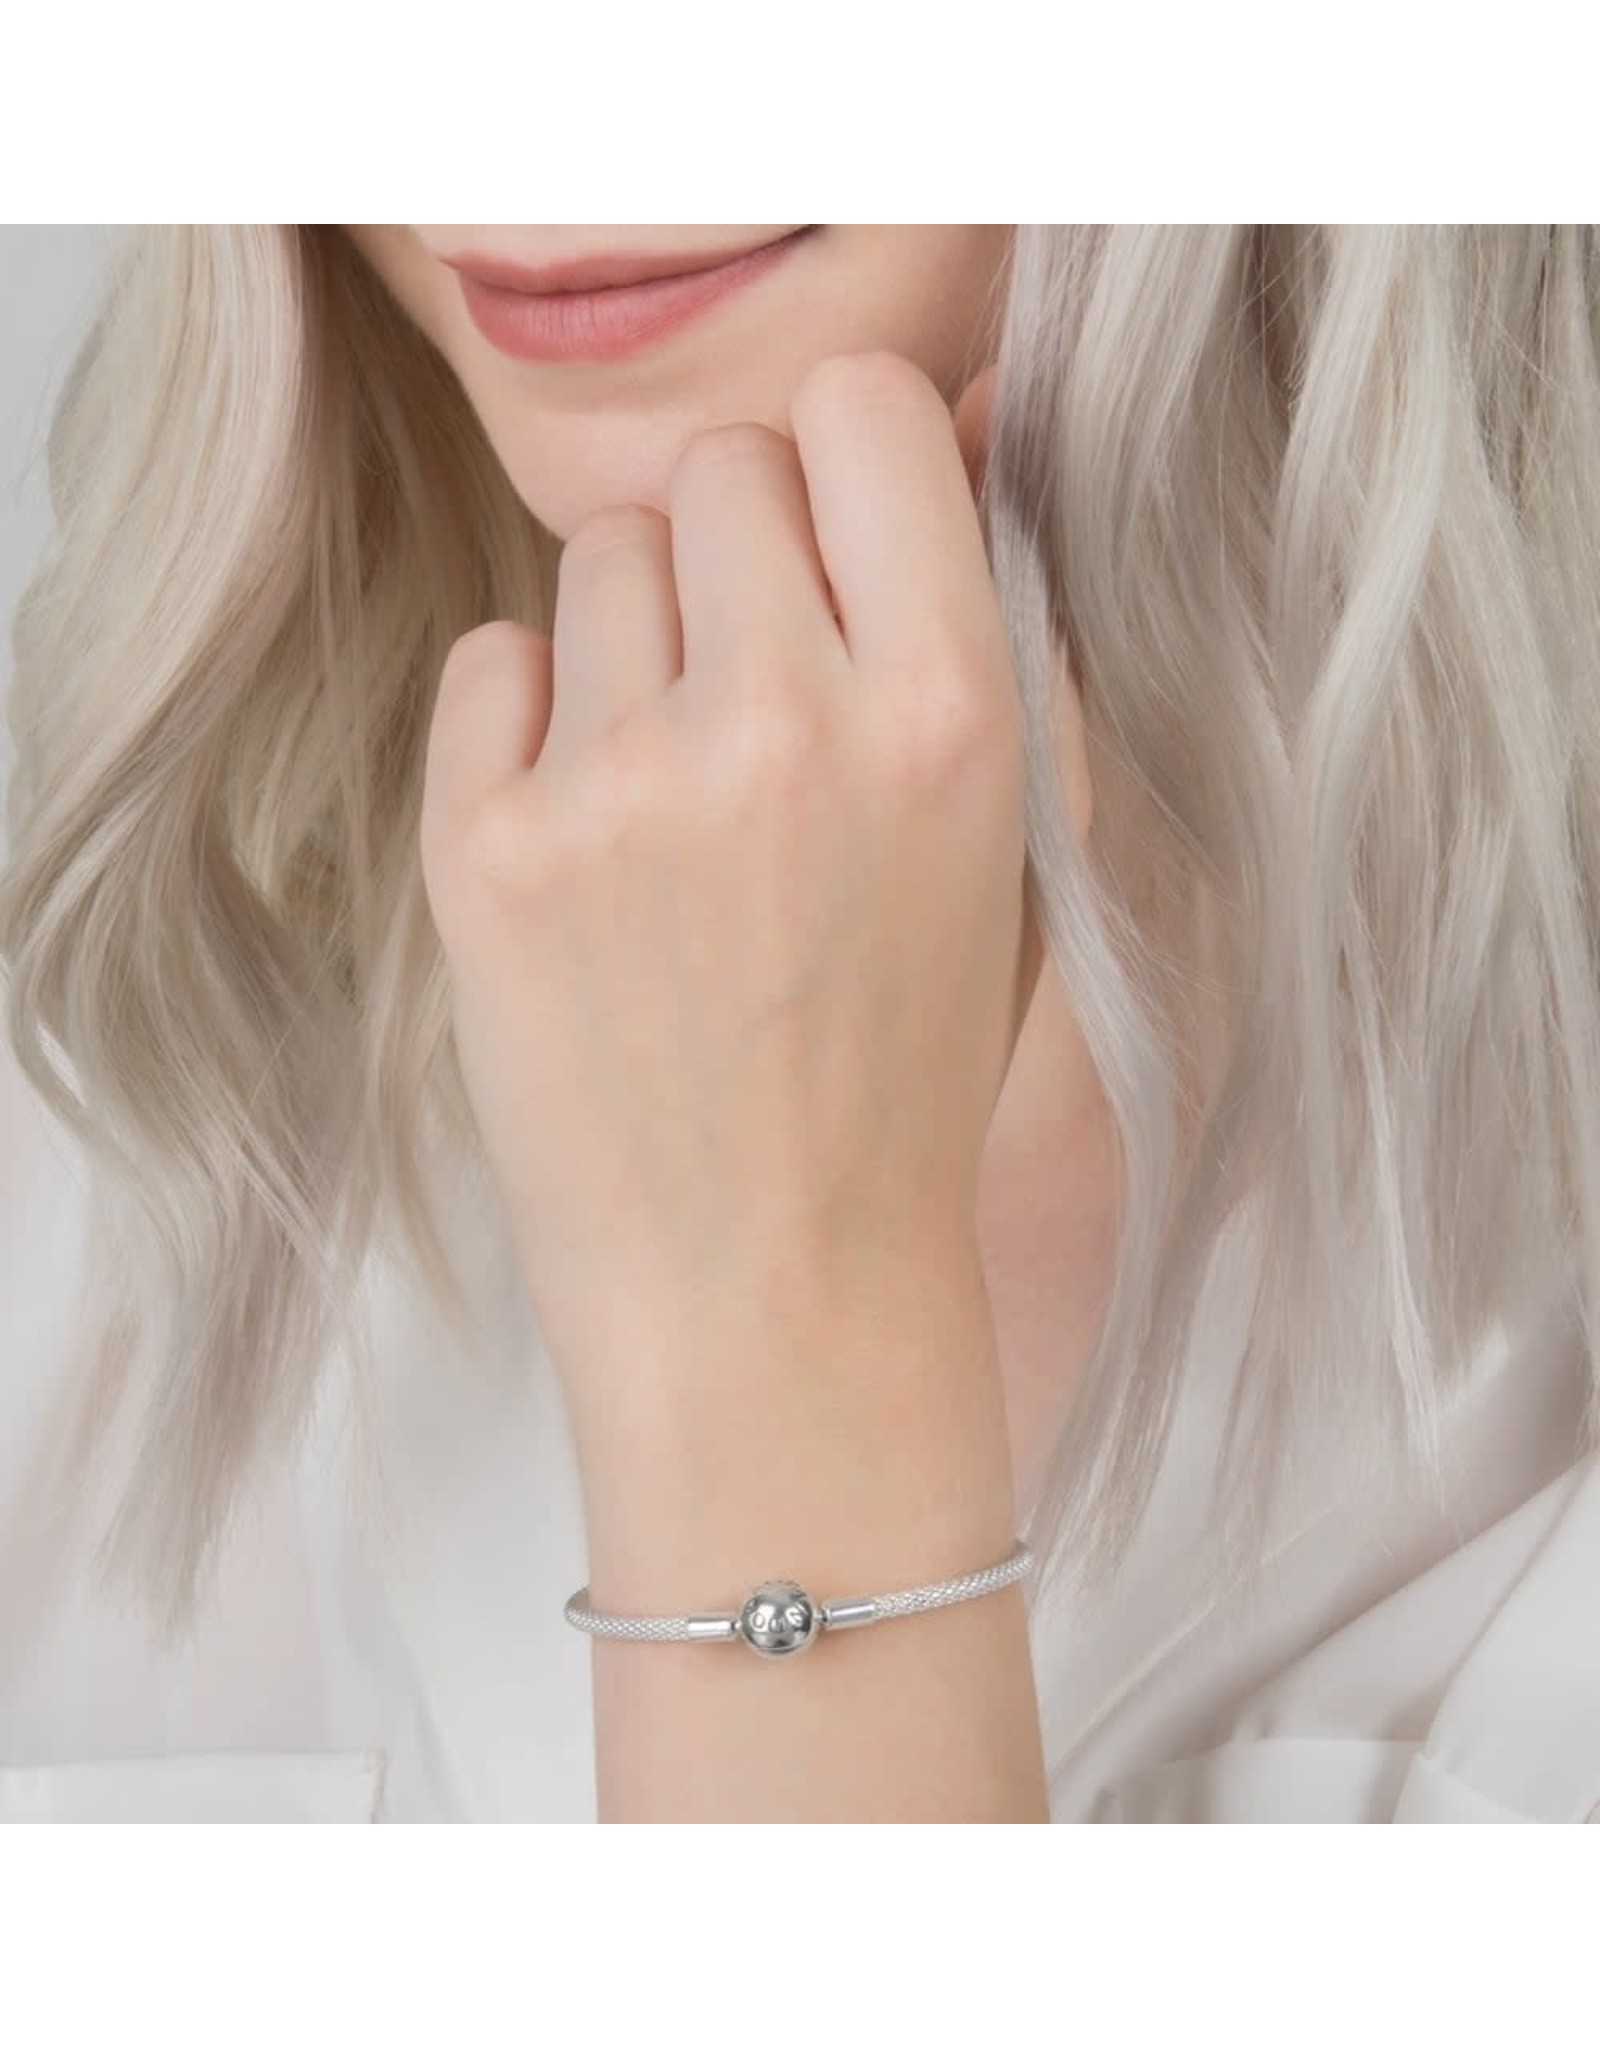 Pandora Pandora Bracelet, 586543, Mesh With Titanium Core